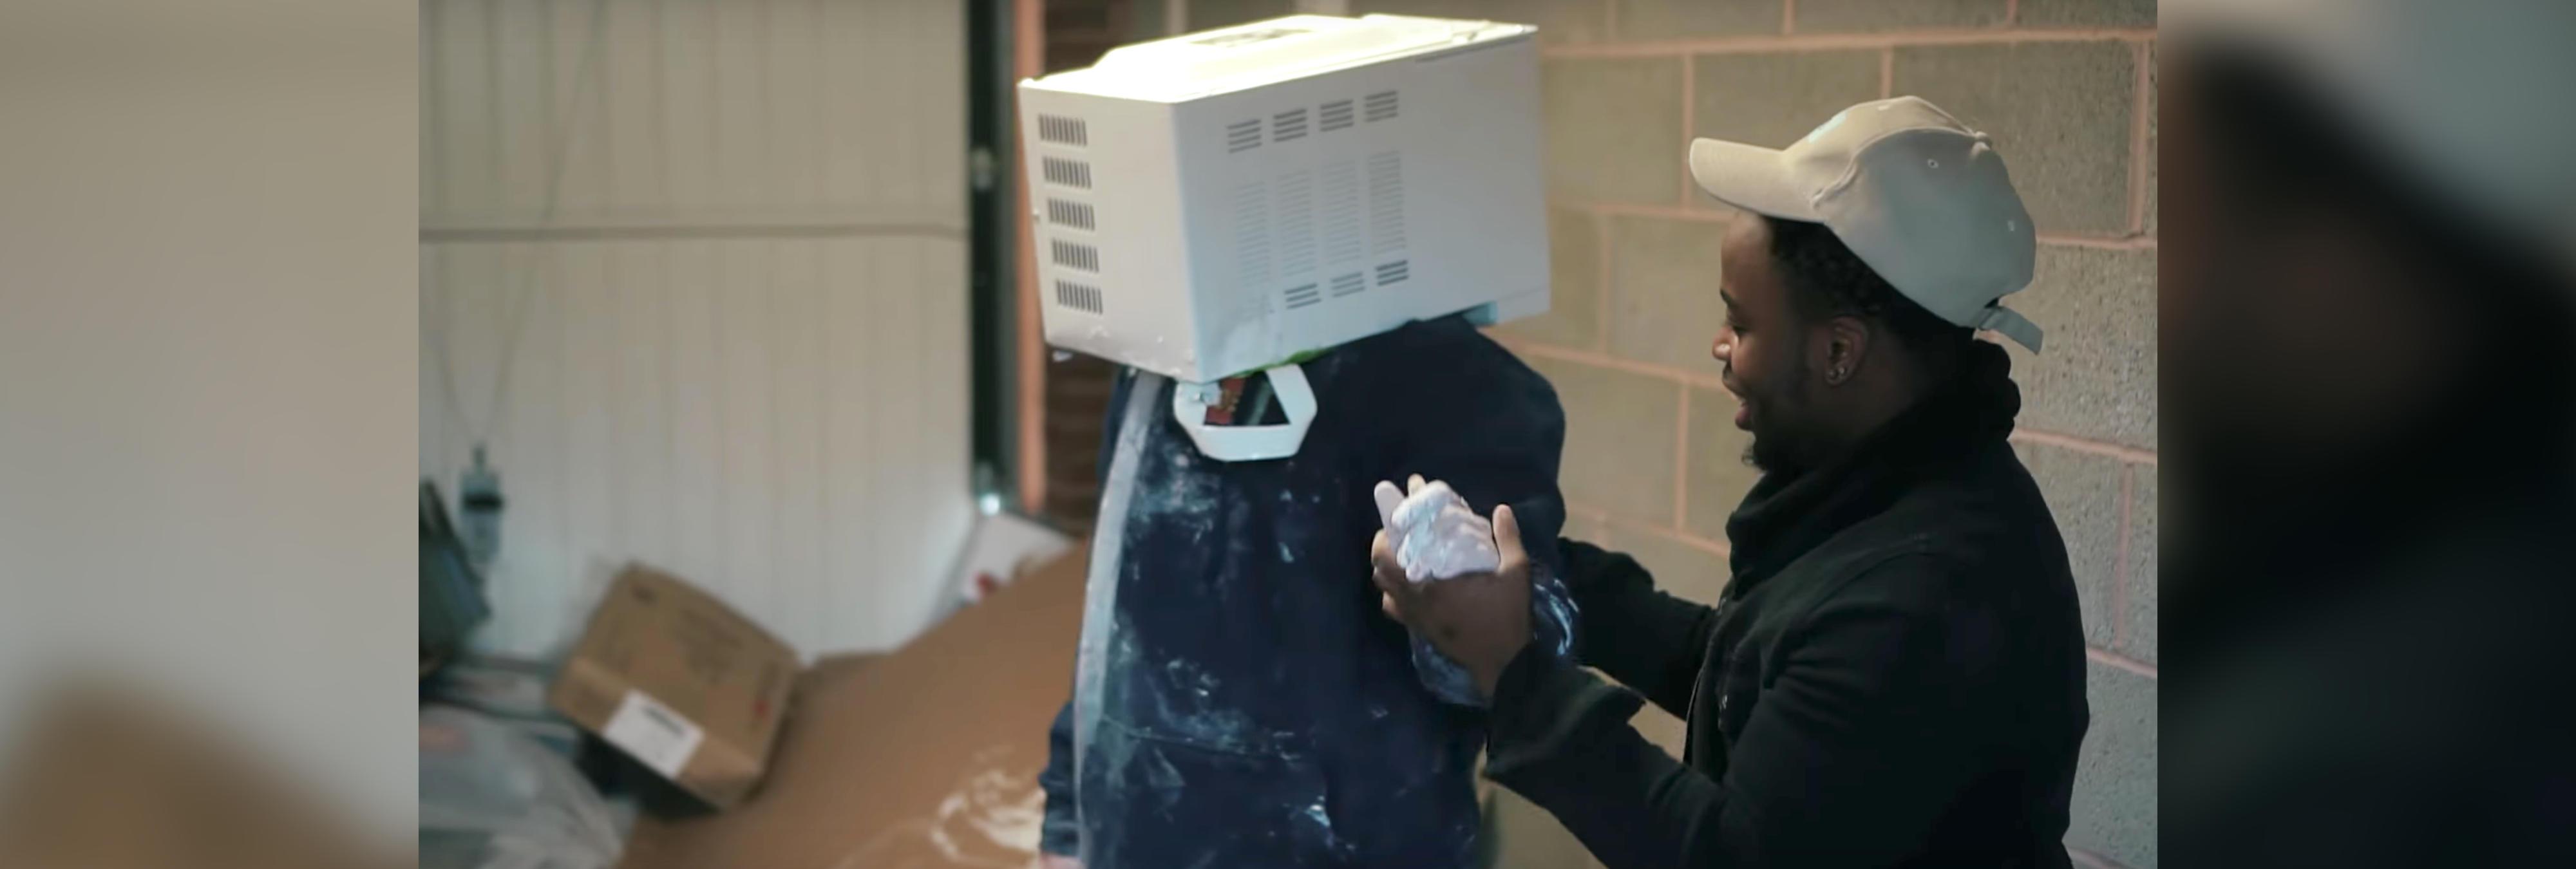 Un youtuber, a punto de morir tras meter su cabeza en un microondas lleno de cemento